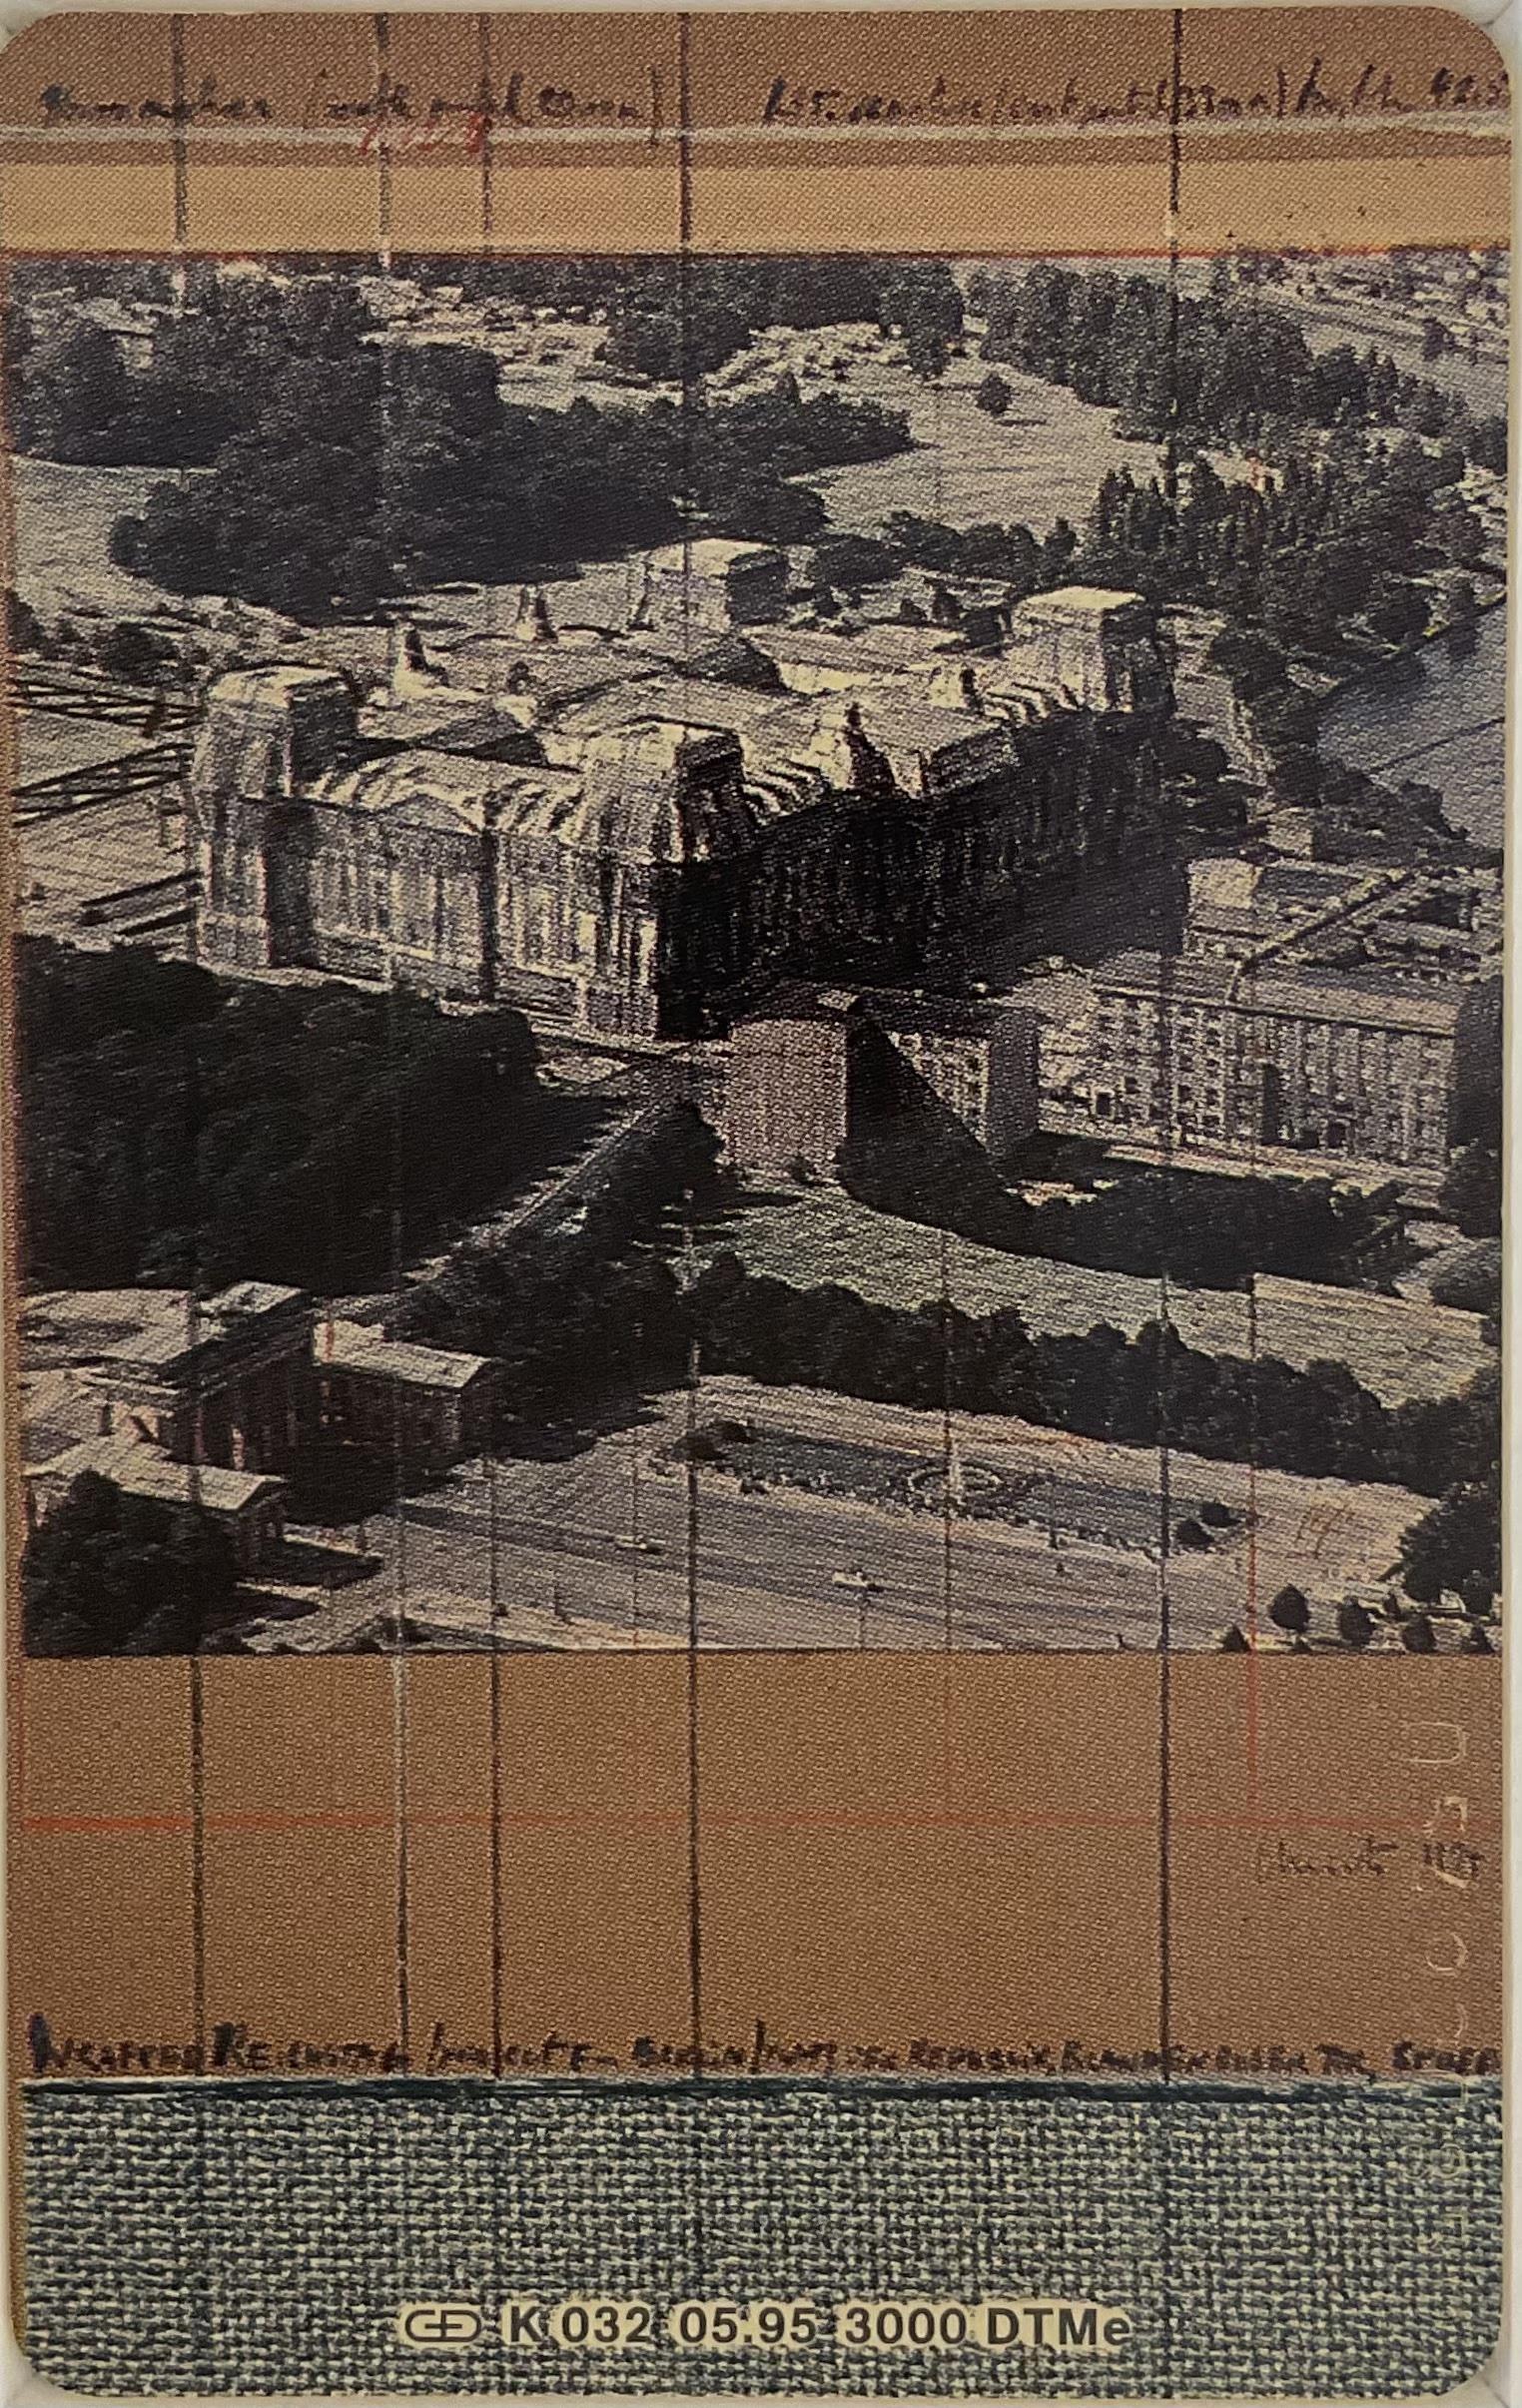 Telefonkarte, Wrapped Reichstag - Christo - k-2109CHR1